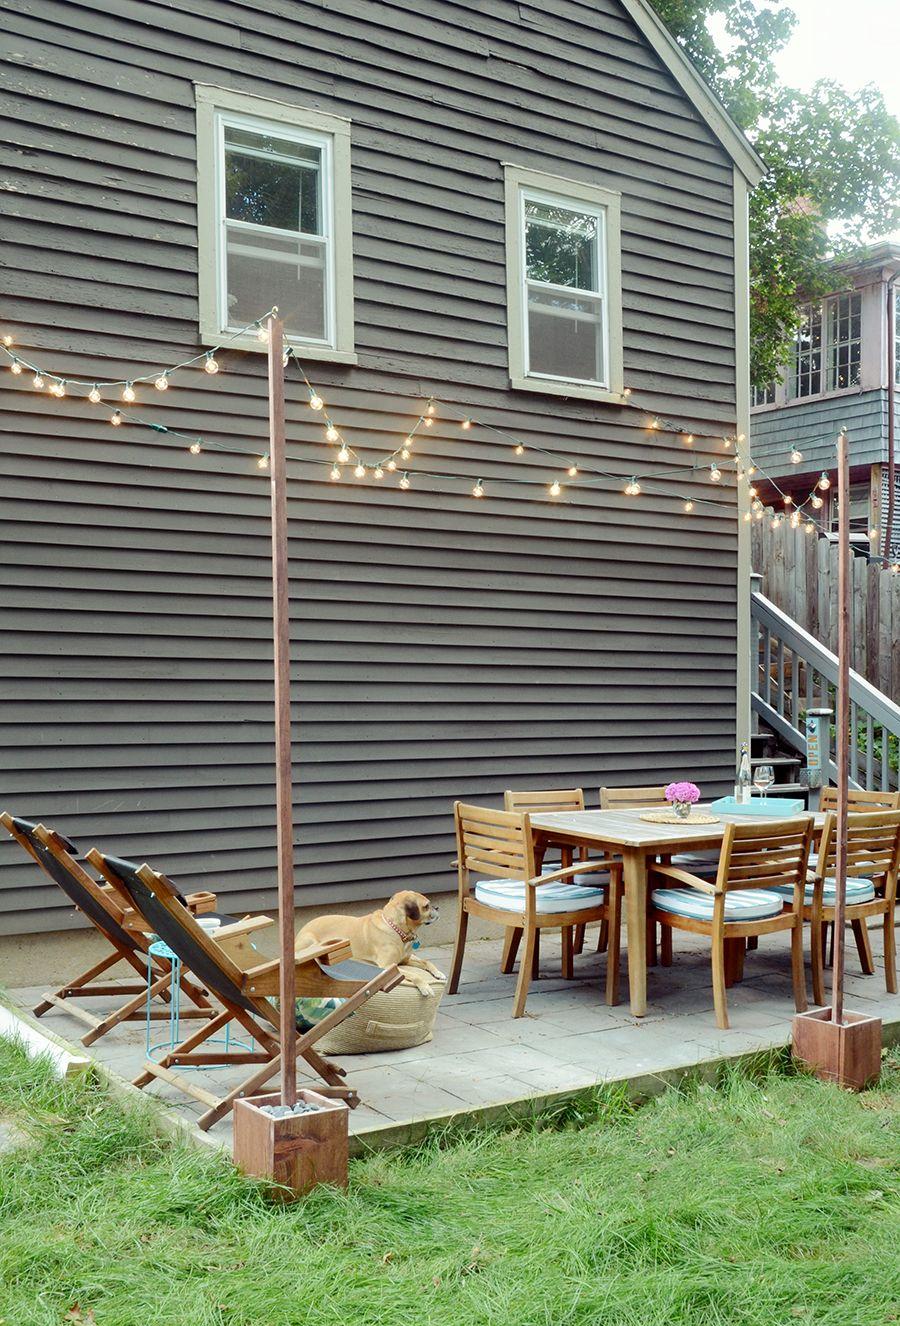 Diy Outdoor Bistro Light Stands For Your Patio Diy Patio